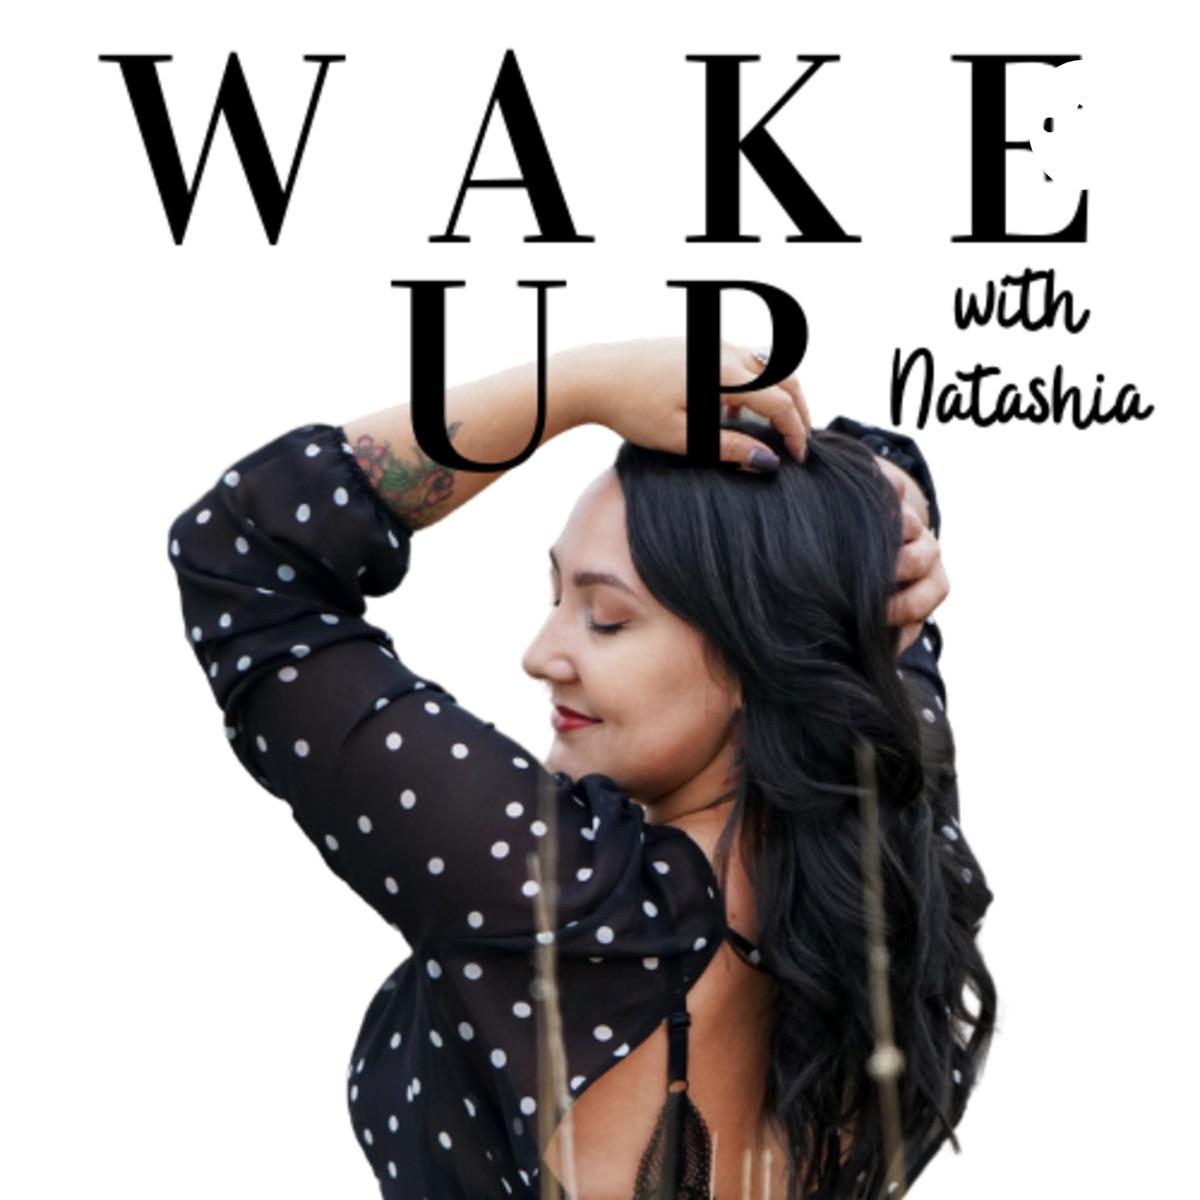 WAKE UP with Natashia